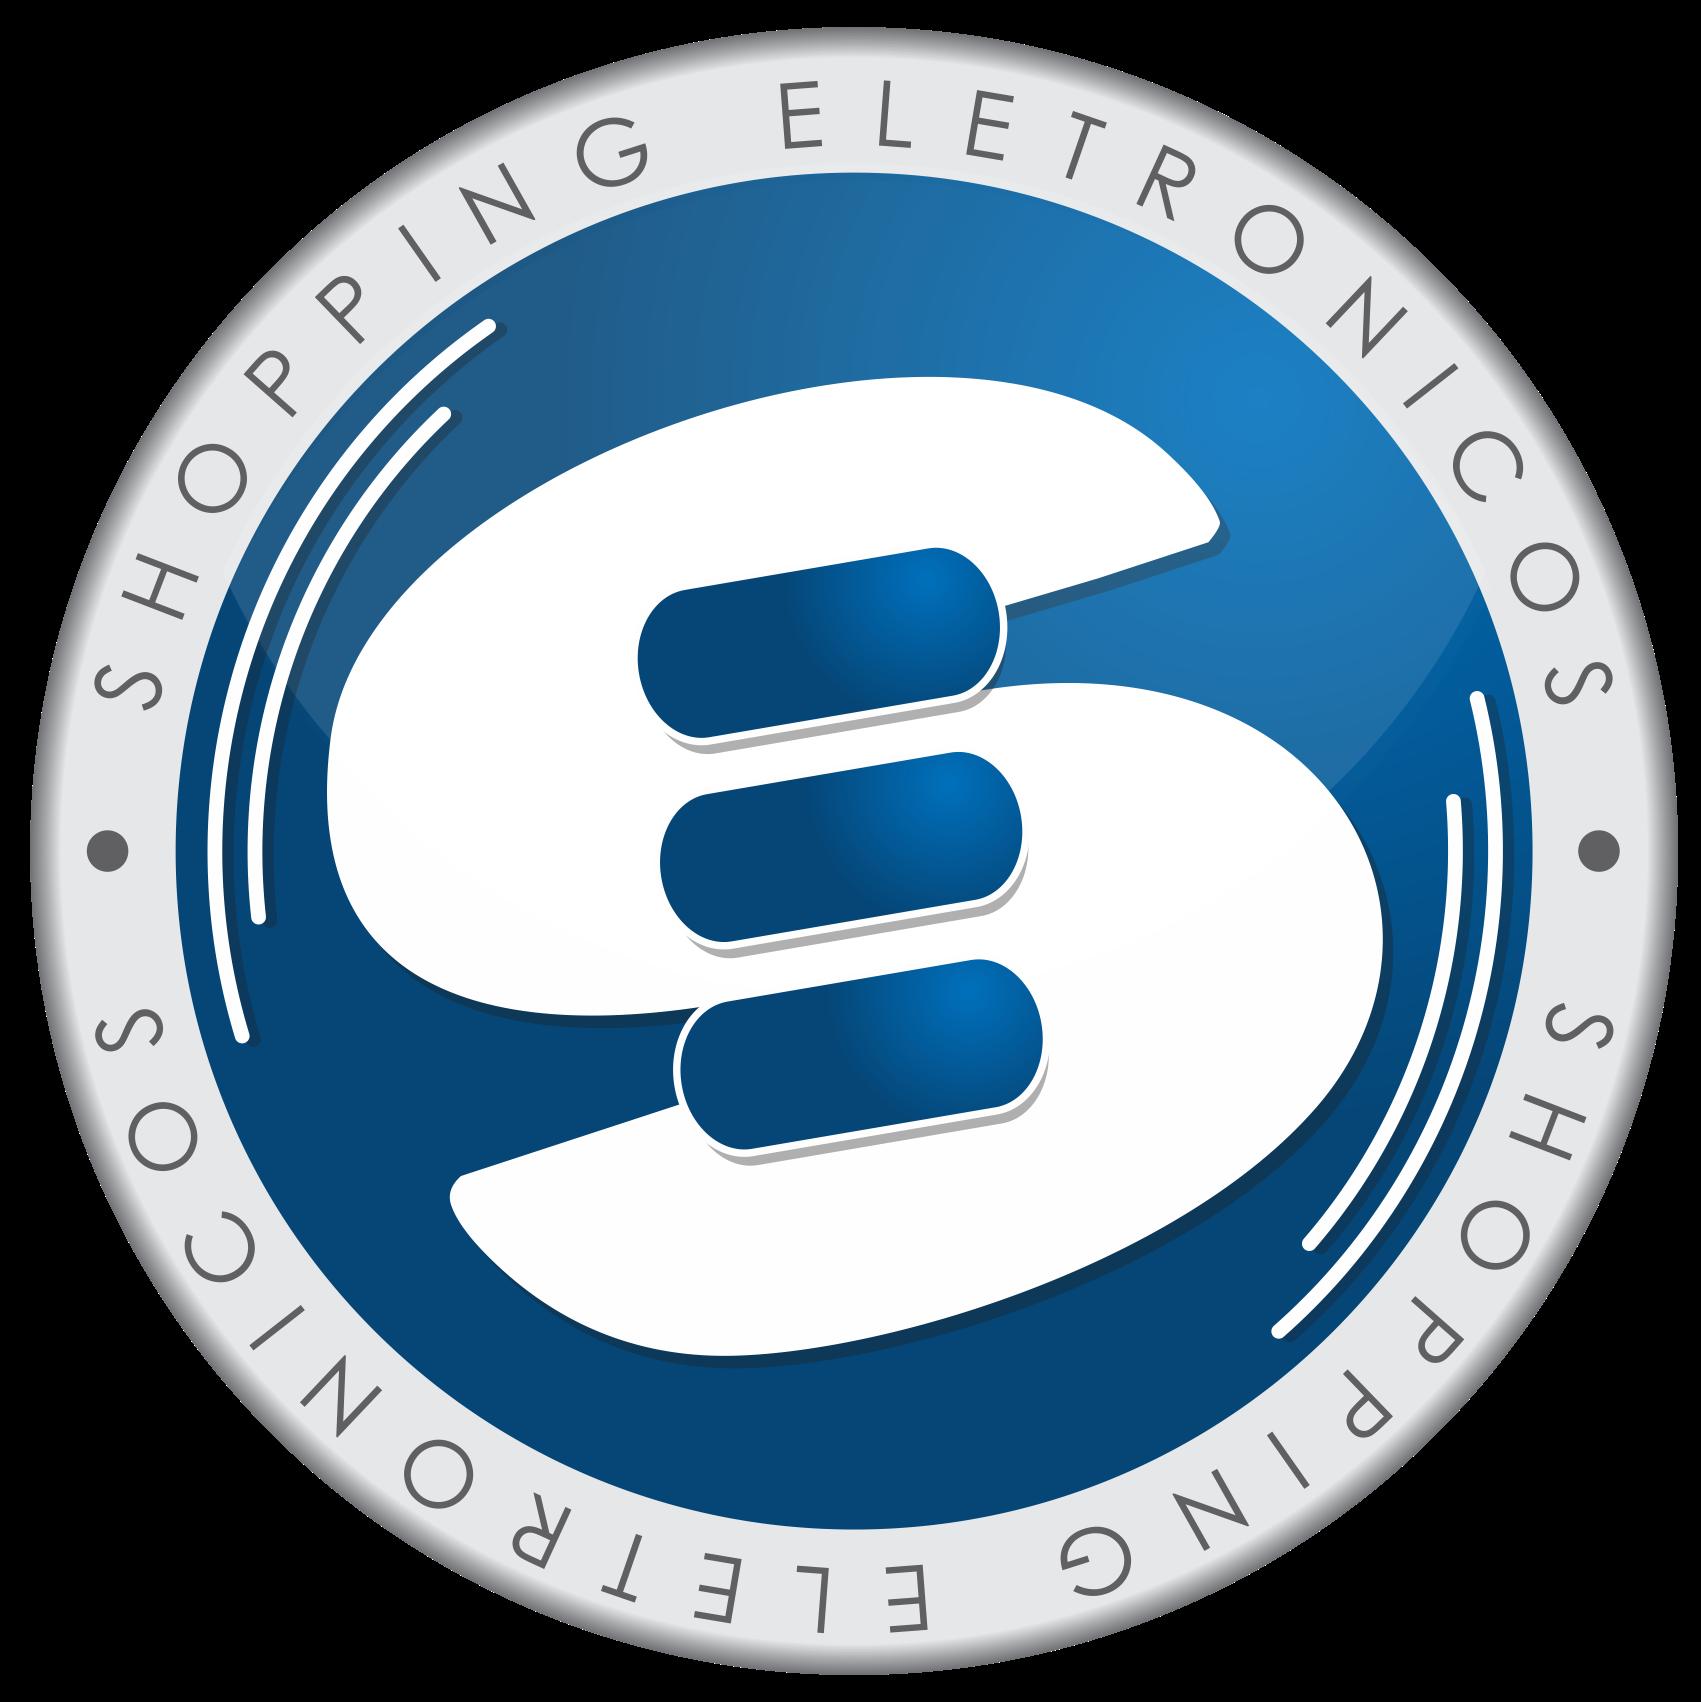 SHOPPING ELETRONICOS